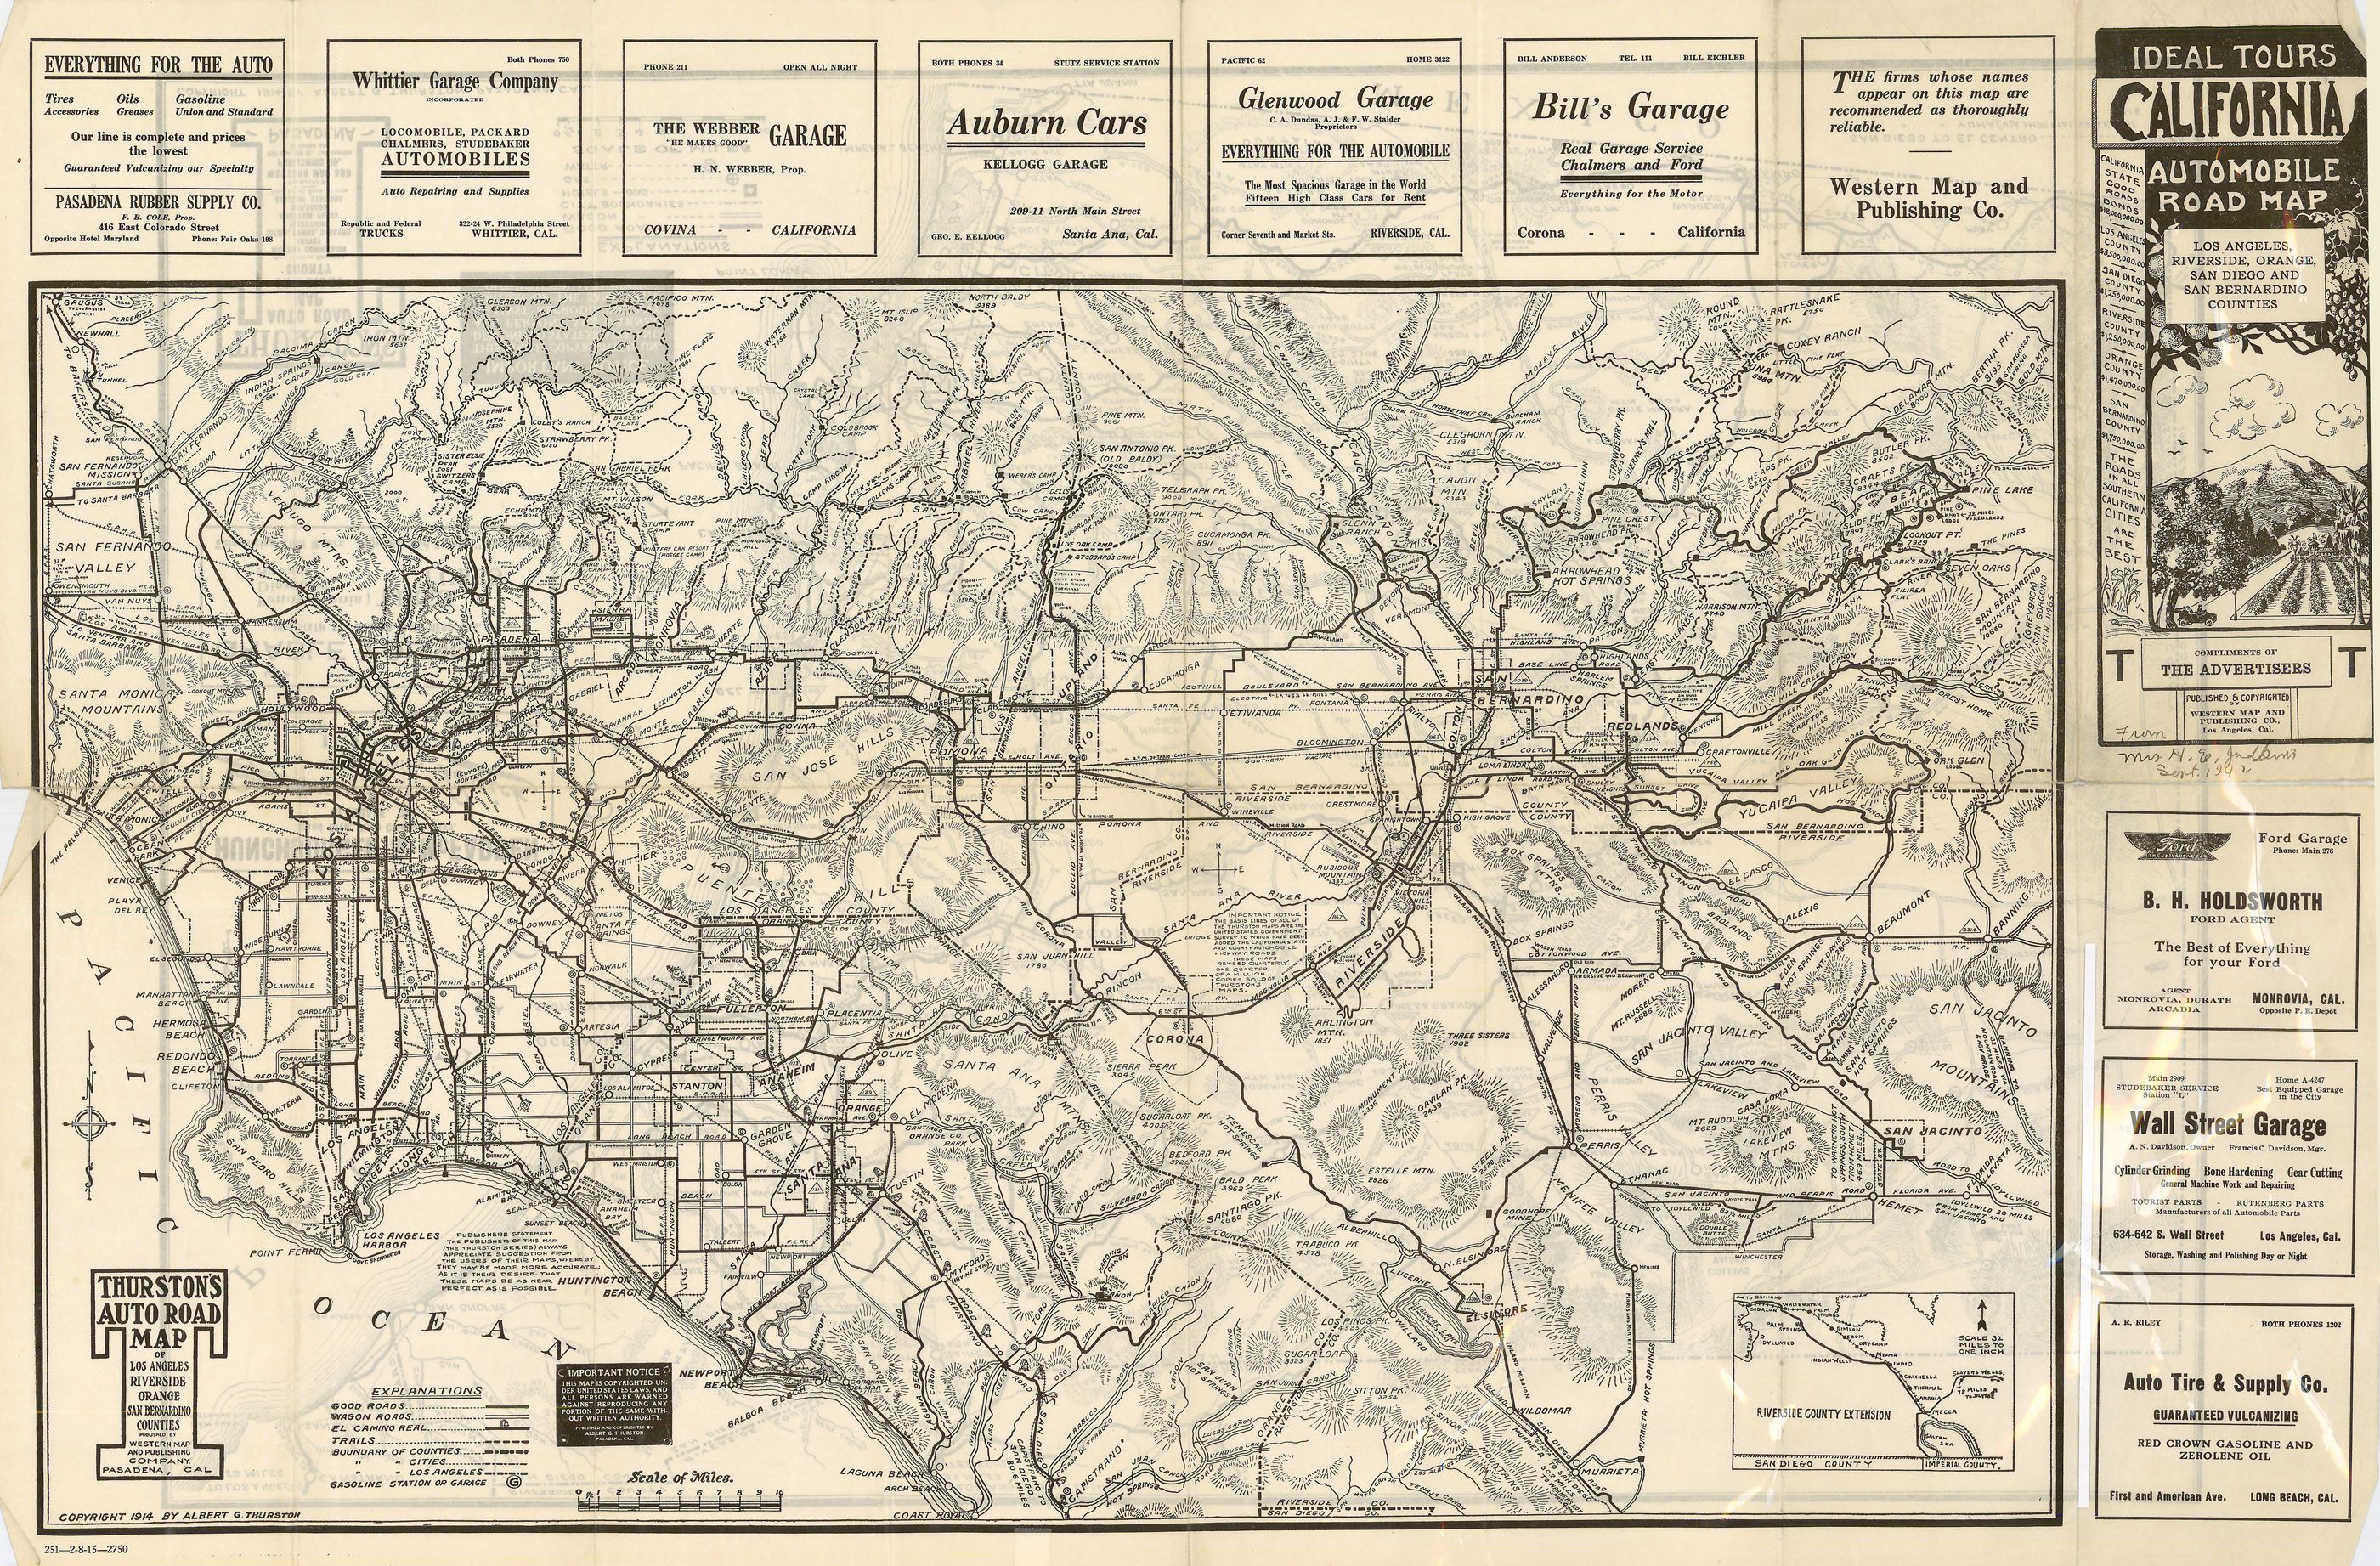 1914 Ideal Tours California Road Map Map California Ca